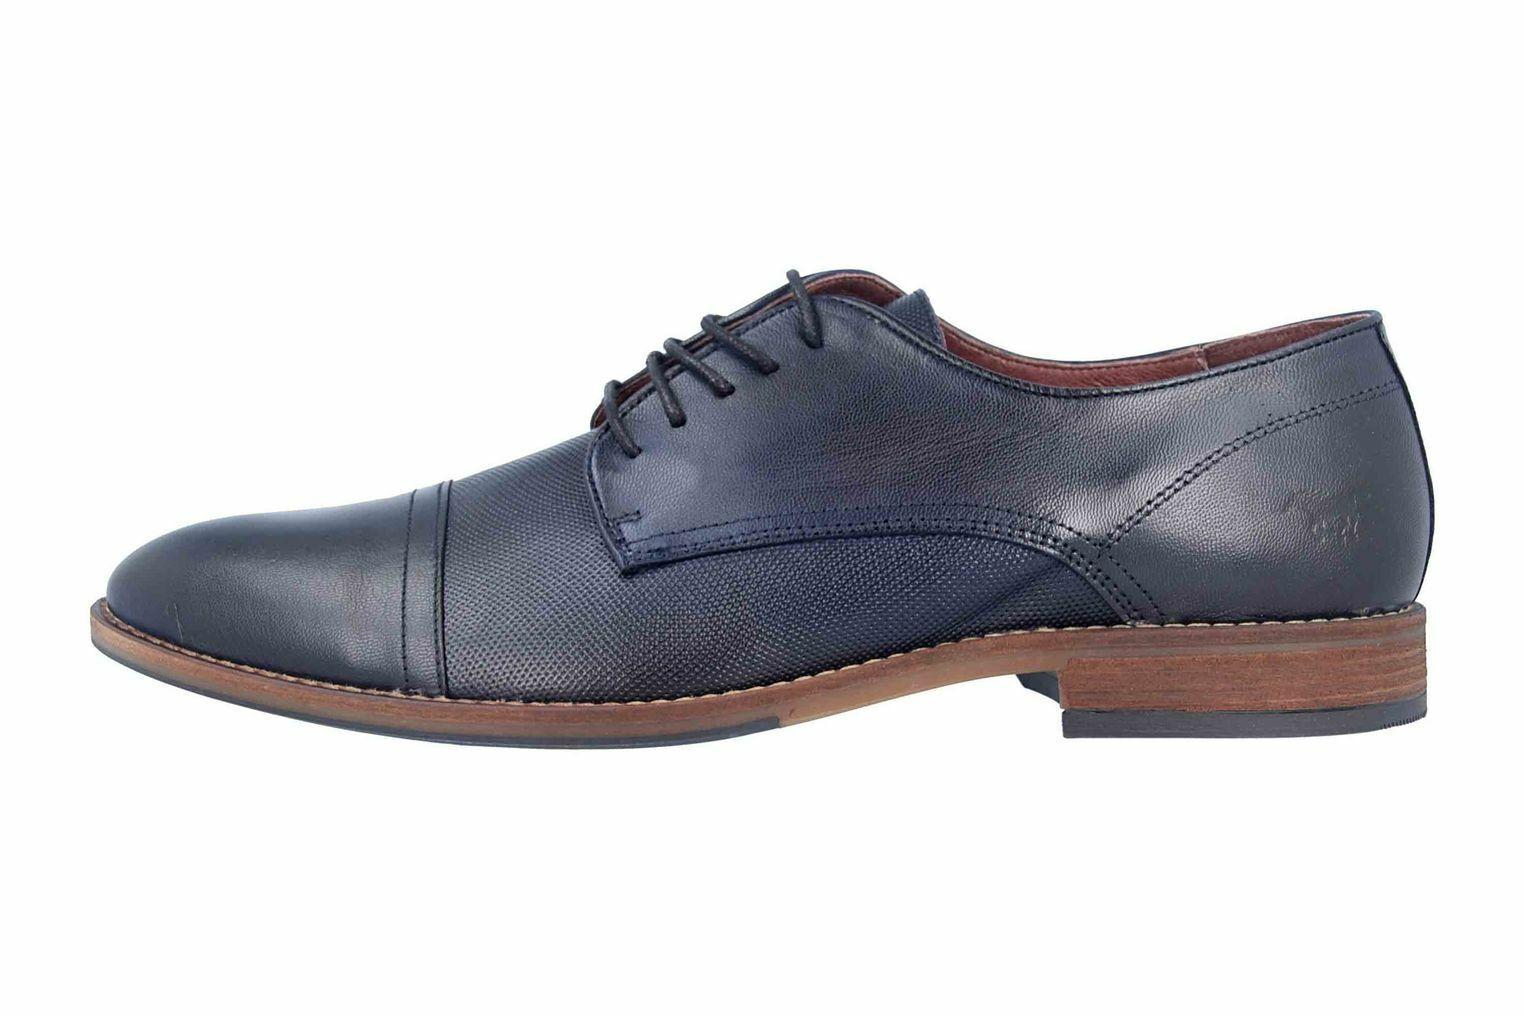 Mustang zapatos zapato bajo en pijama azul 4904-304-820 grandes zapatos caballero